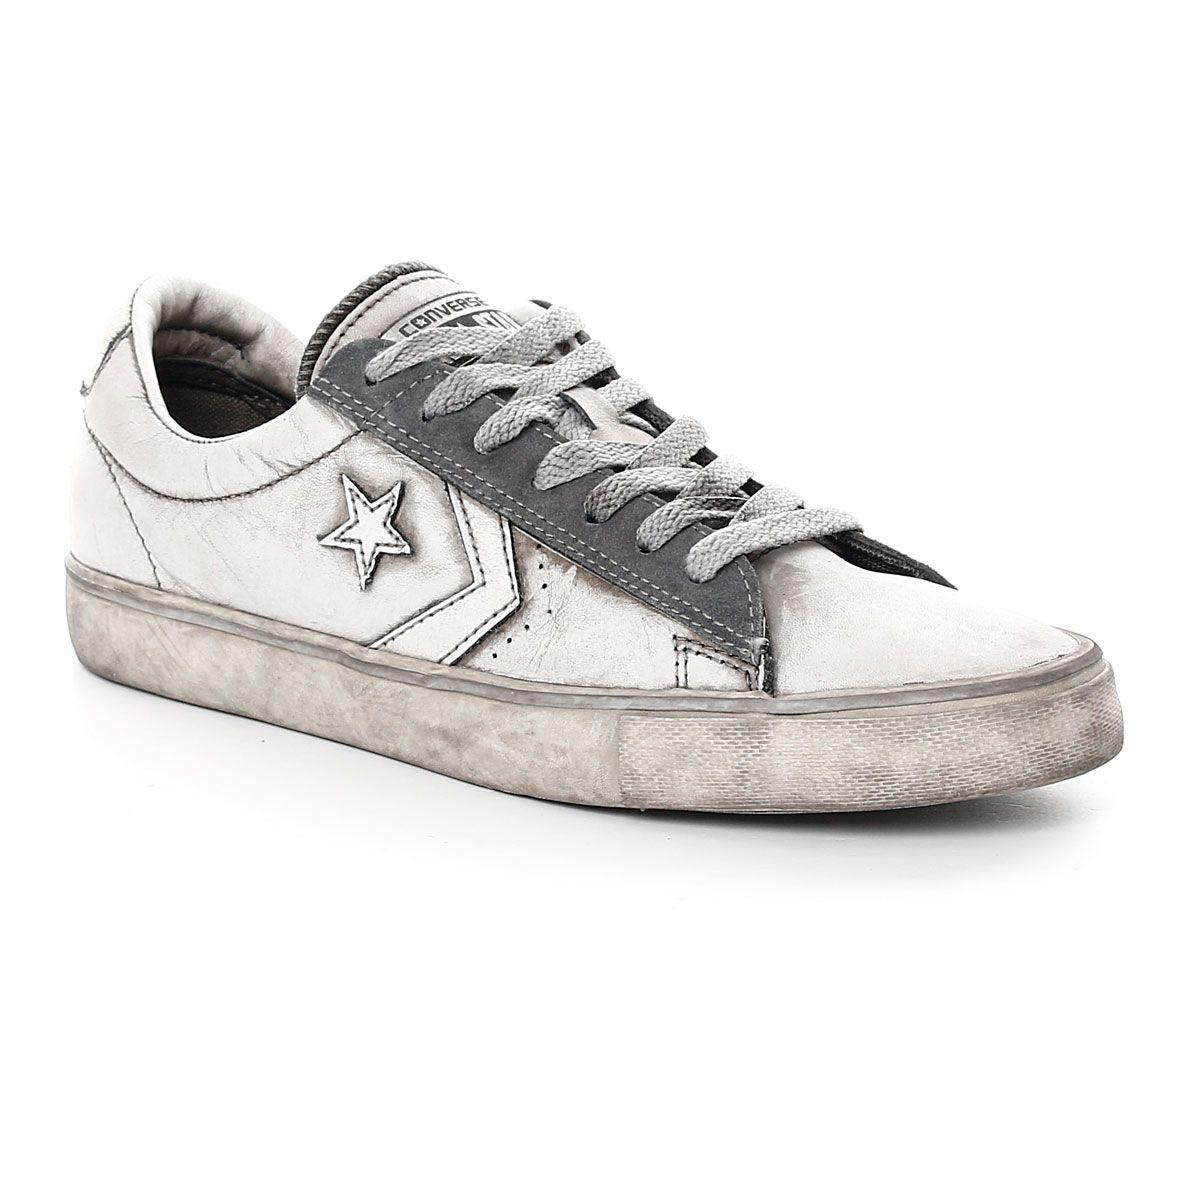 Converse Pro Leather Limited Edition Smoke White